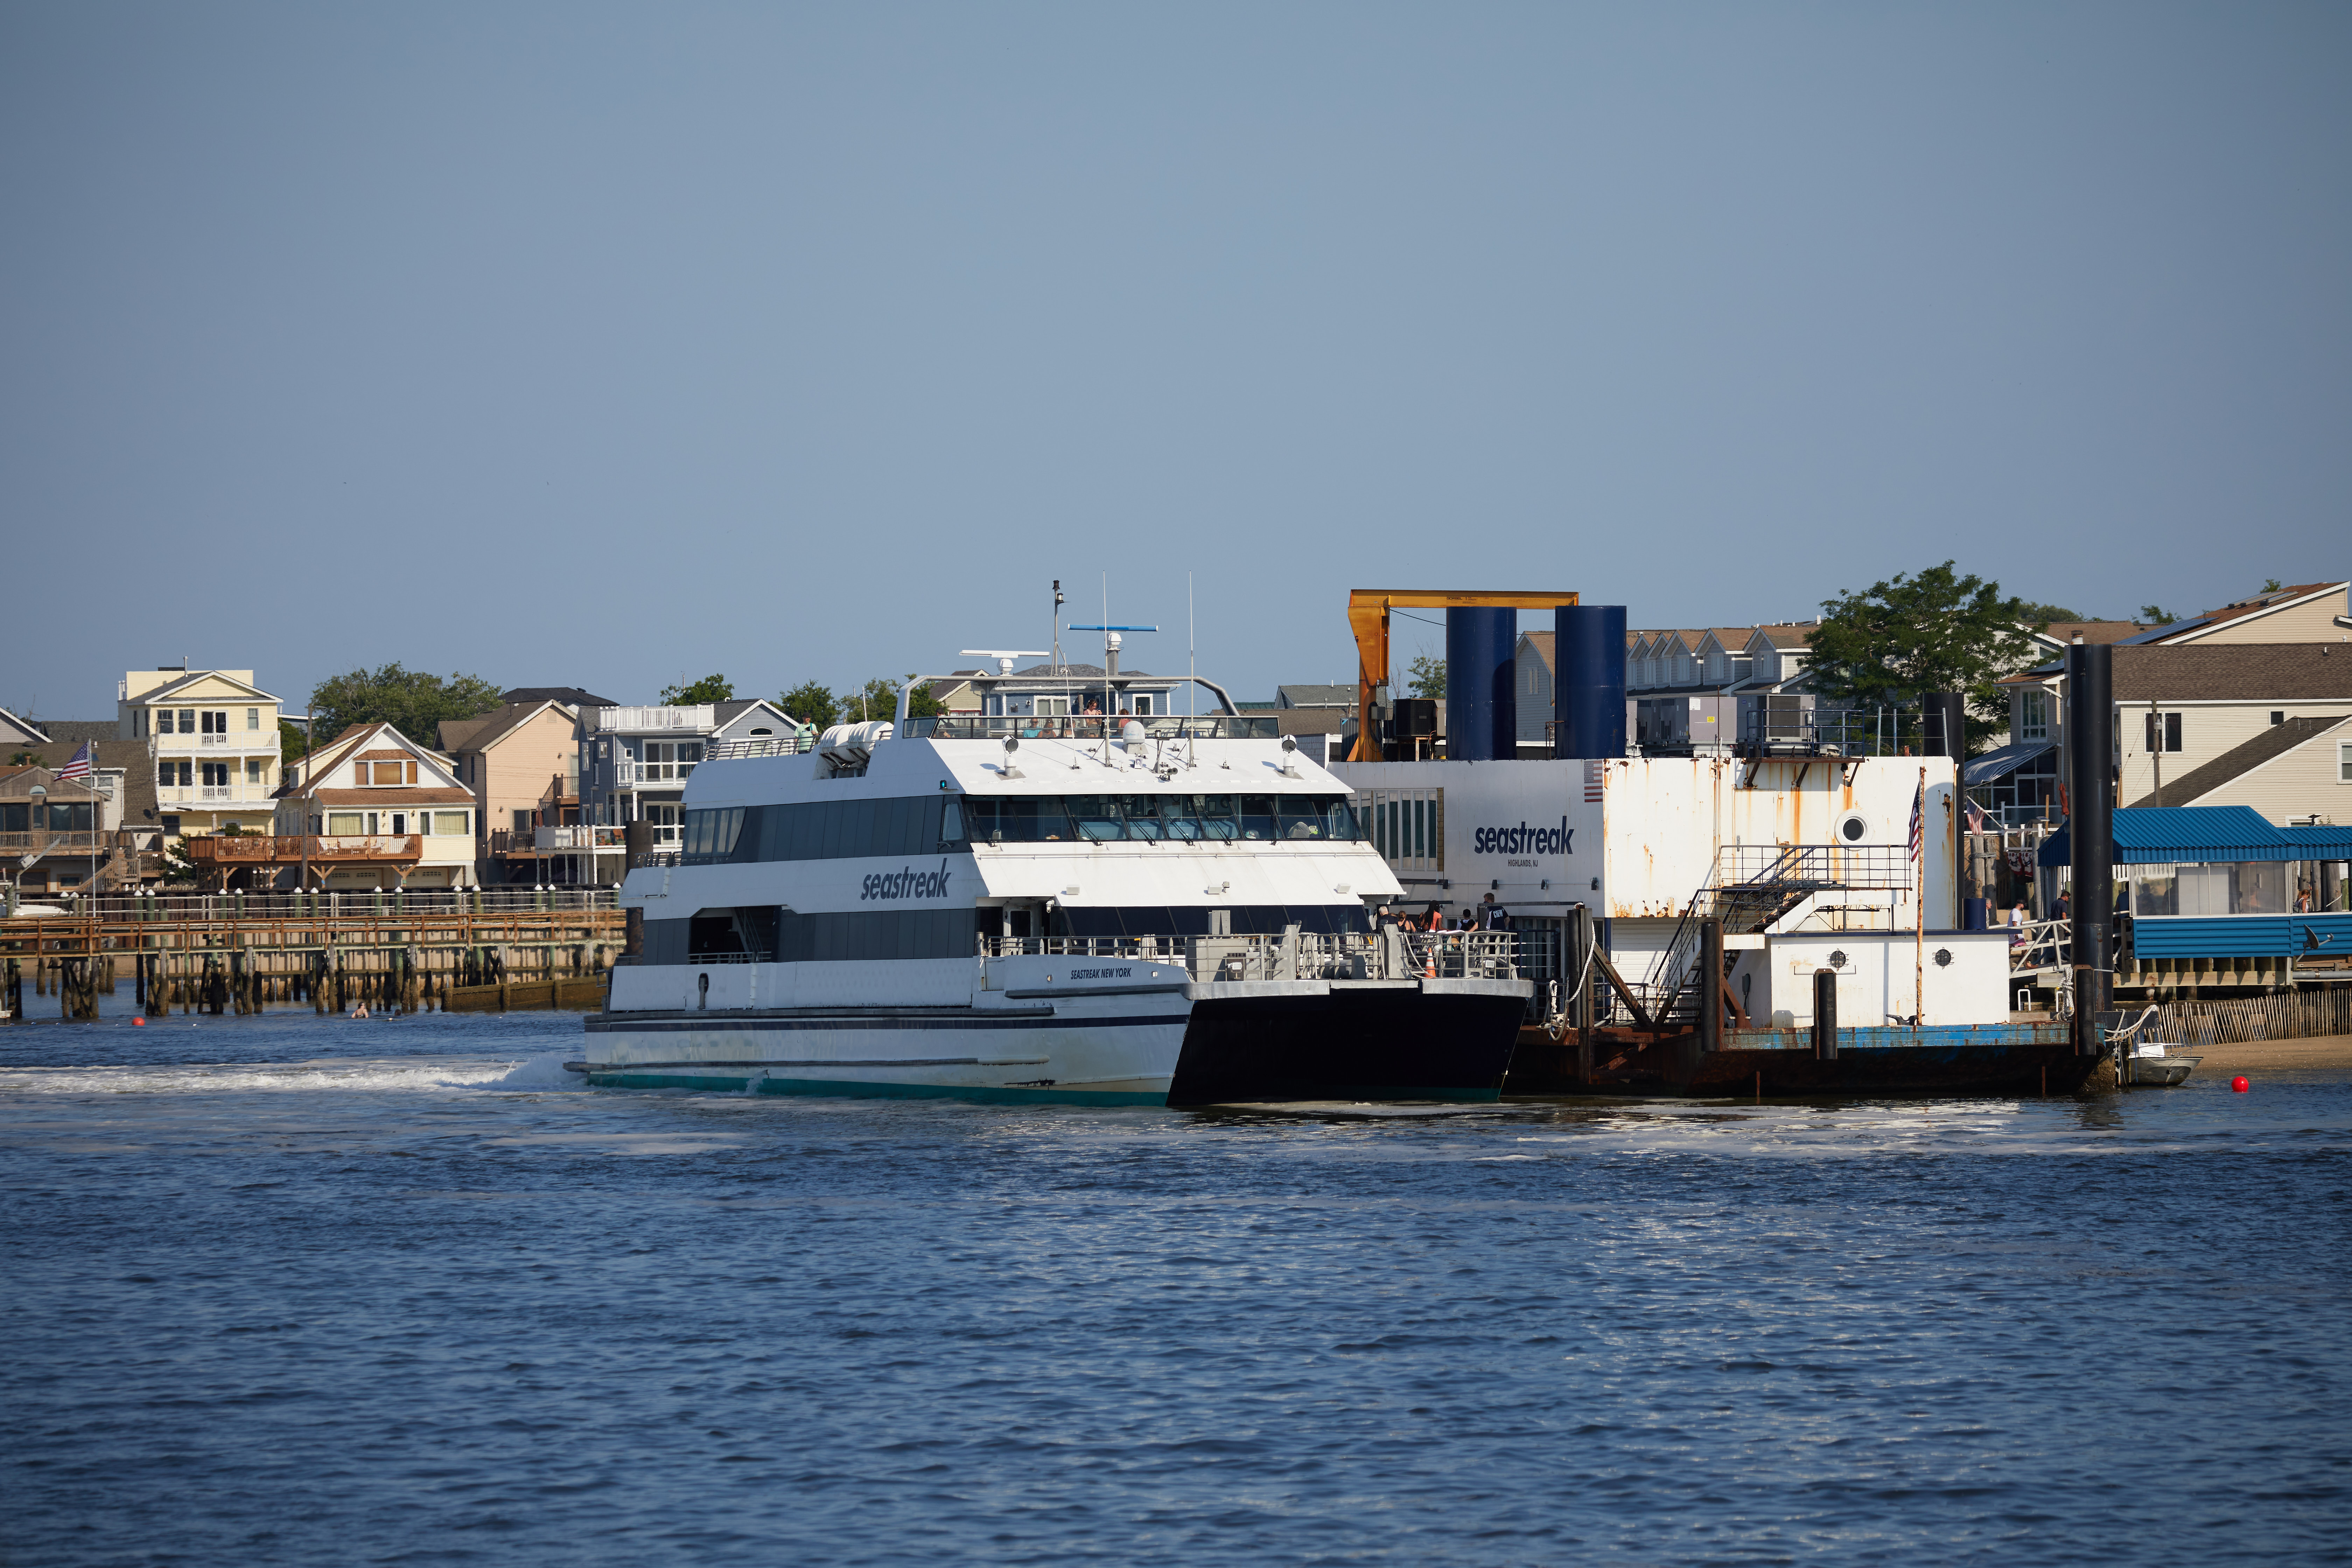 Seastreak Ferry docked at terminal.